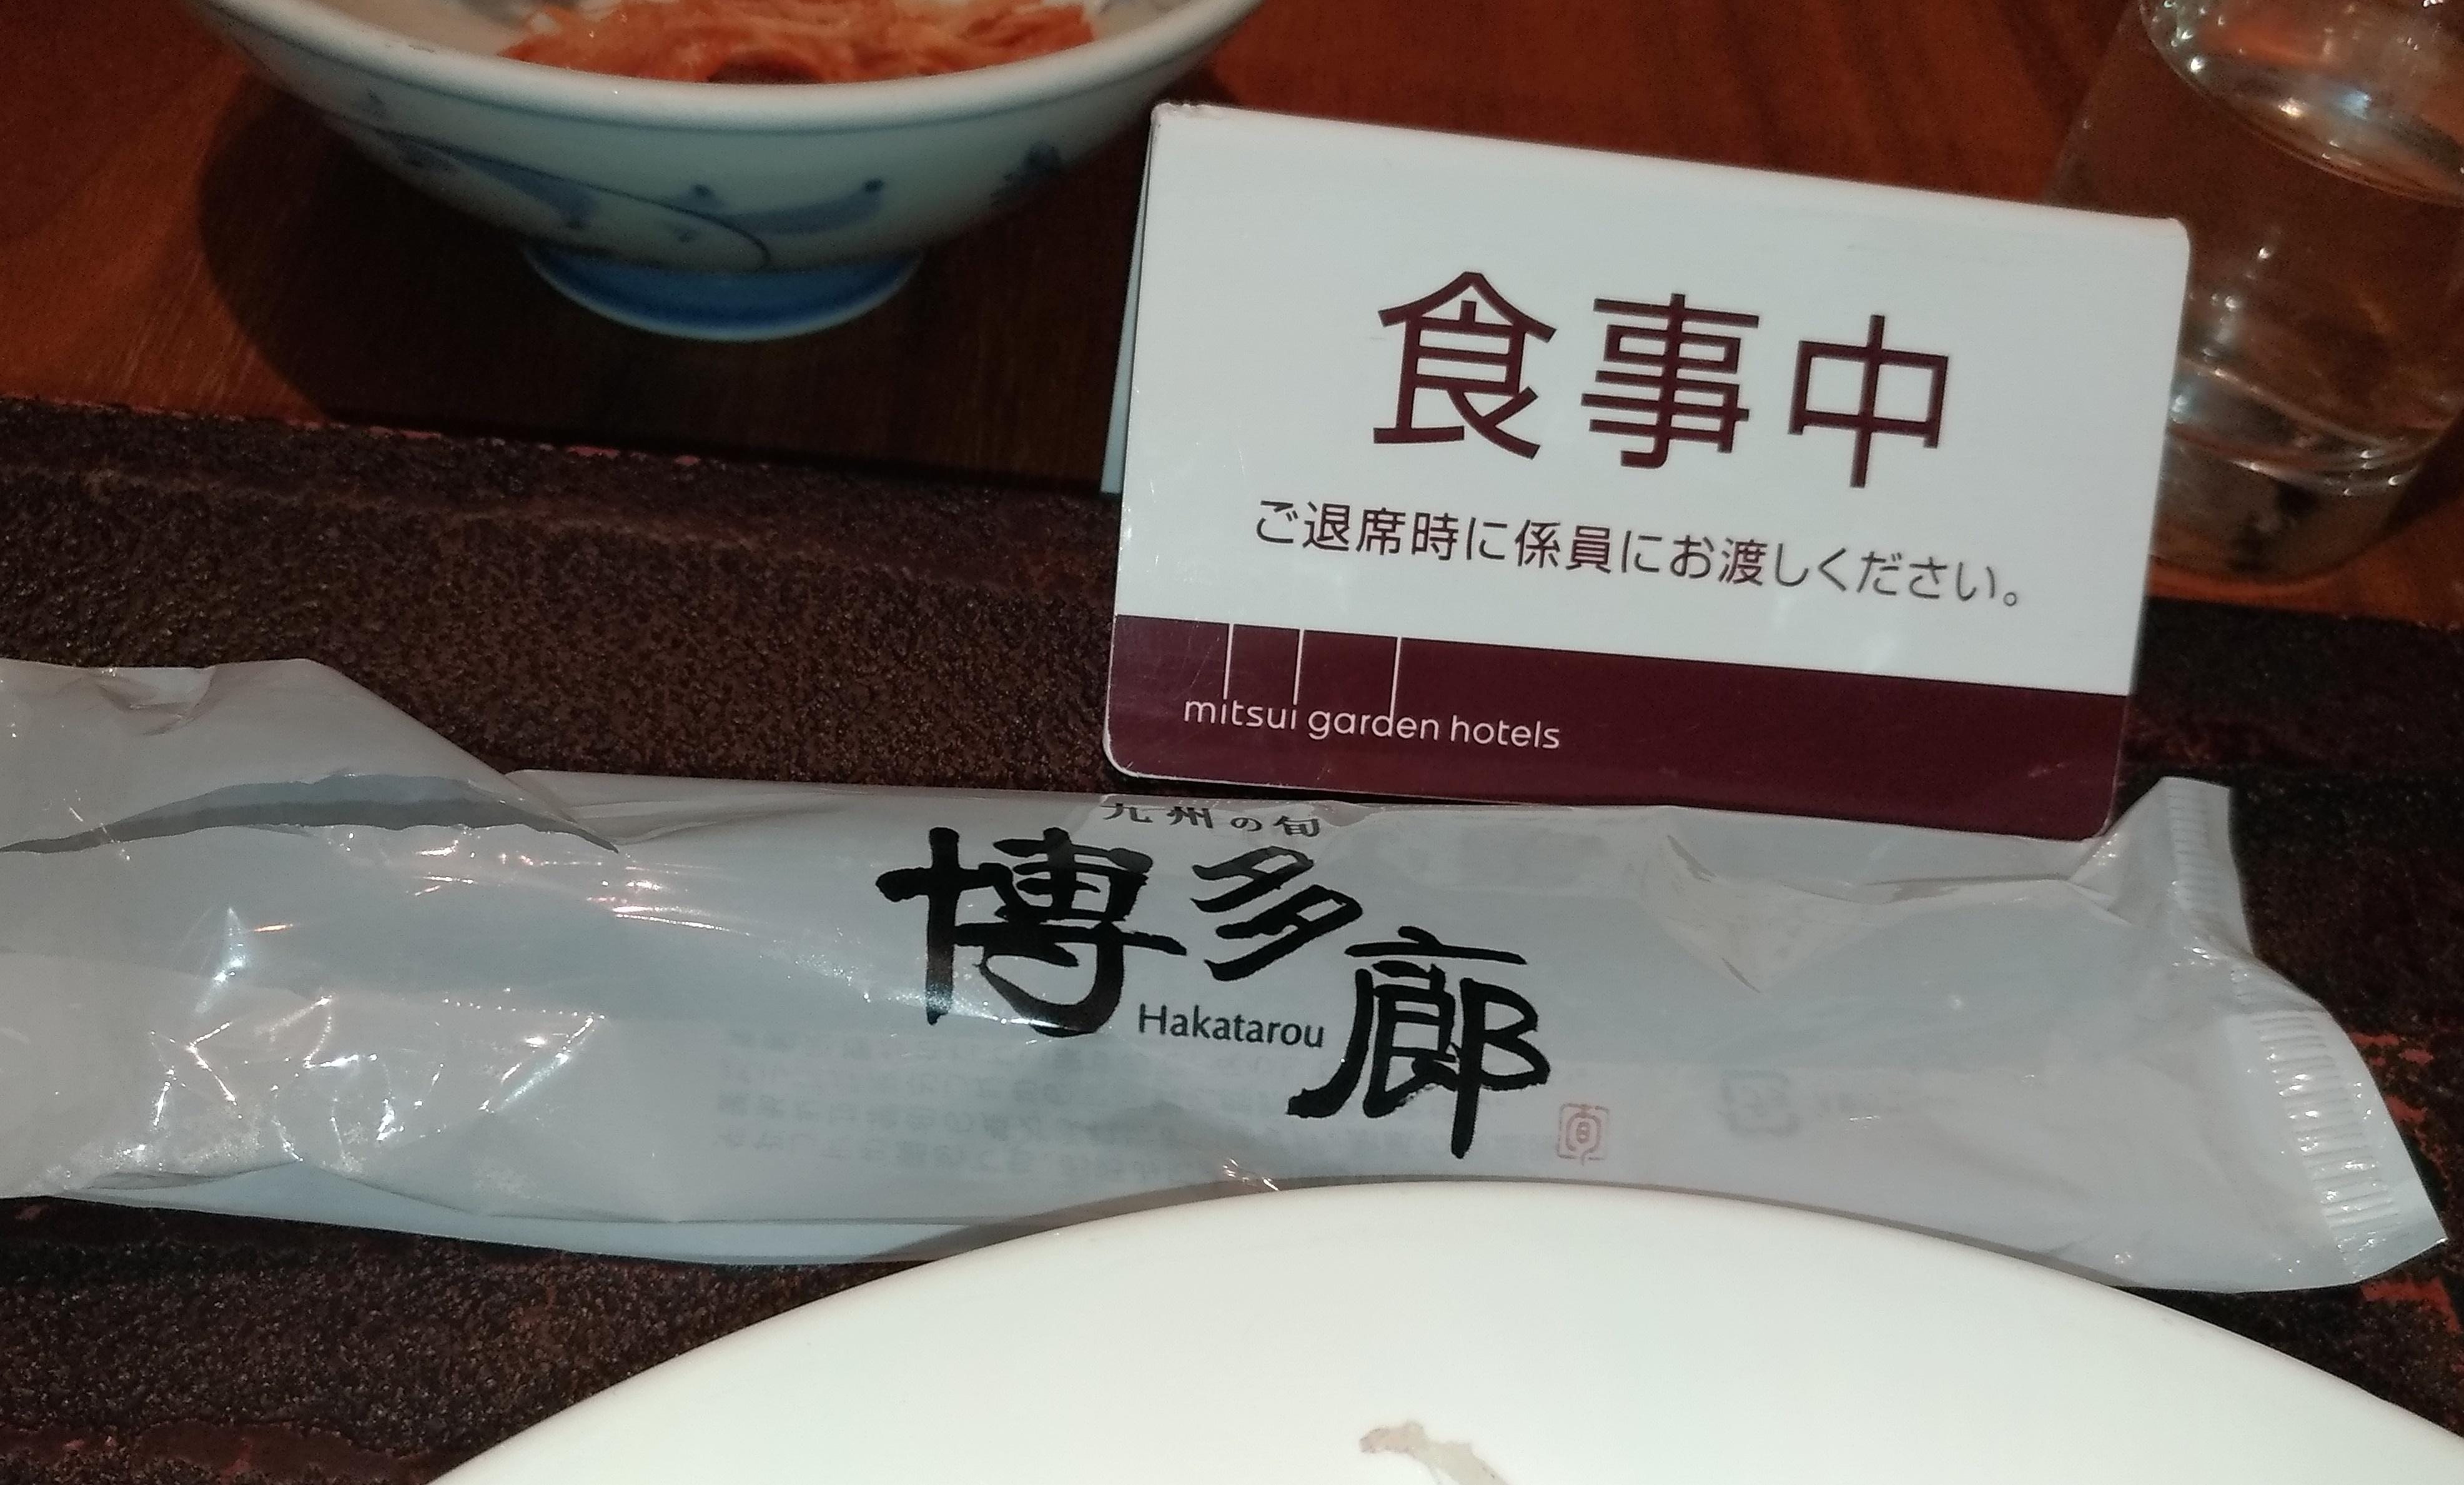 viking_hotel_osaka_mitsui_3.jpg